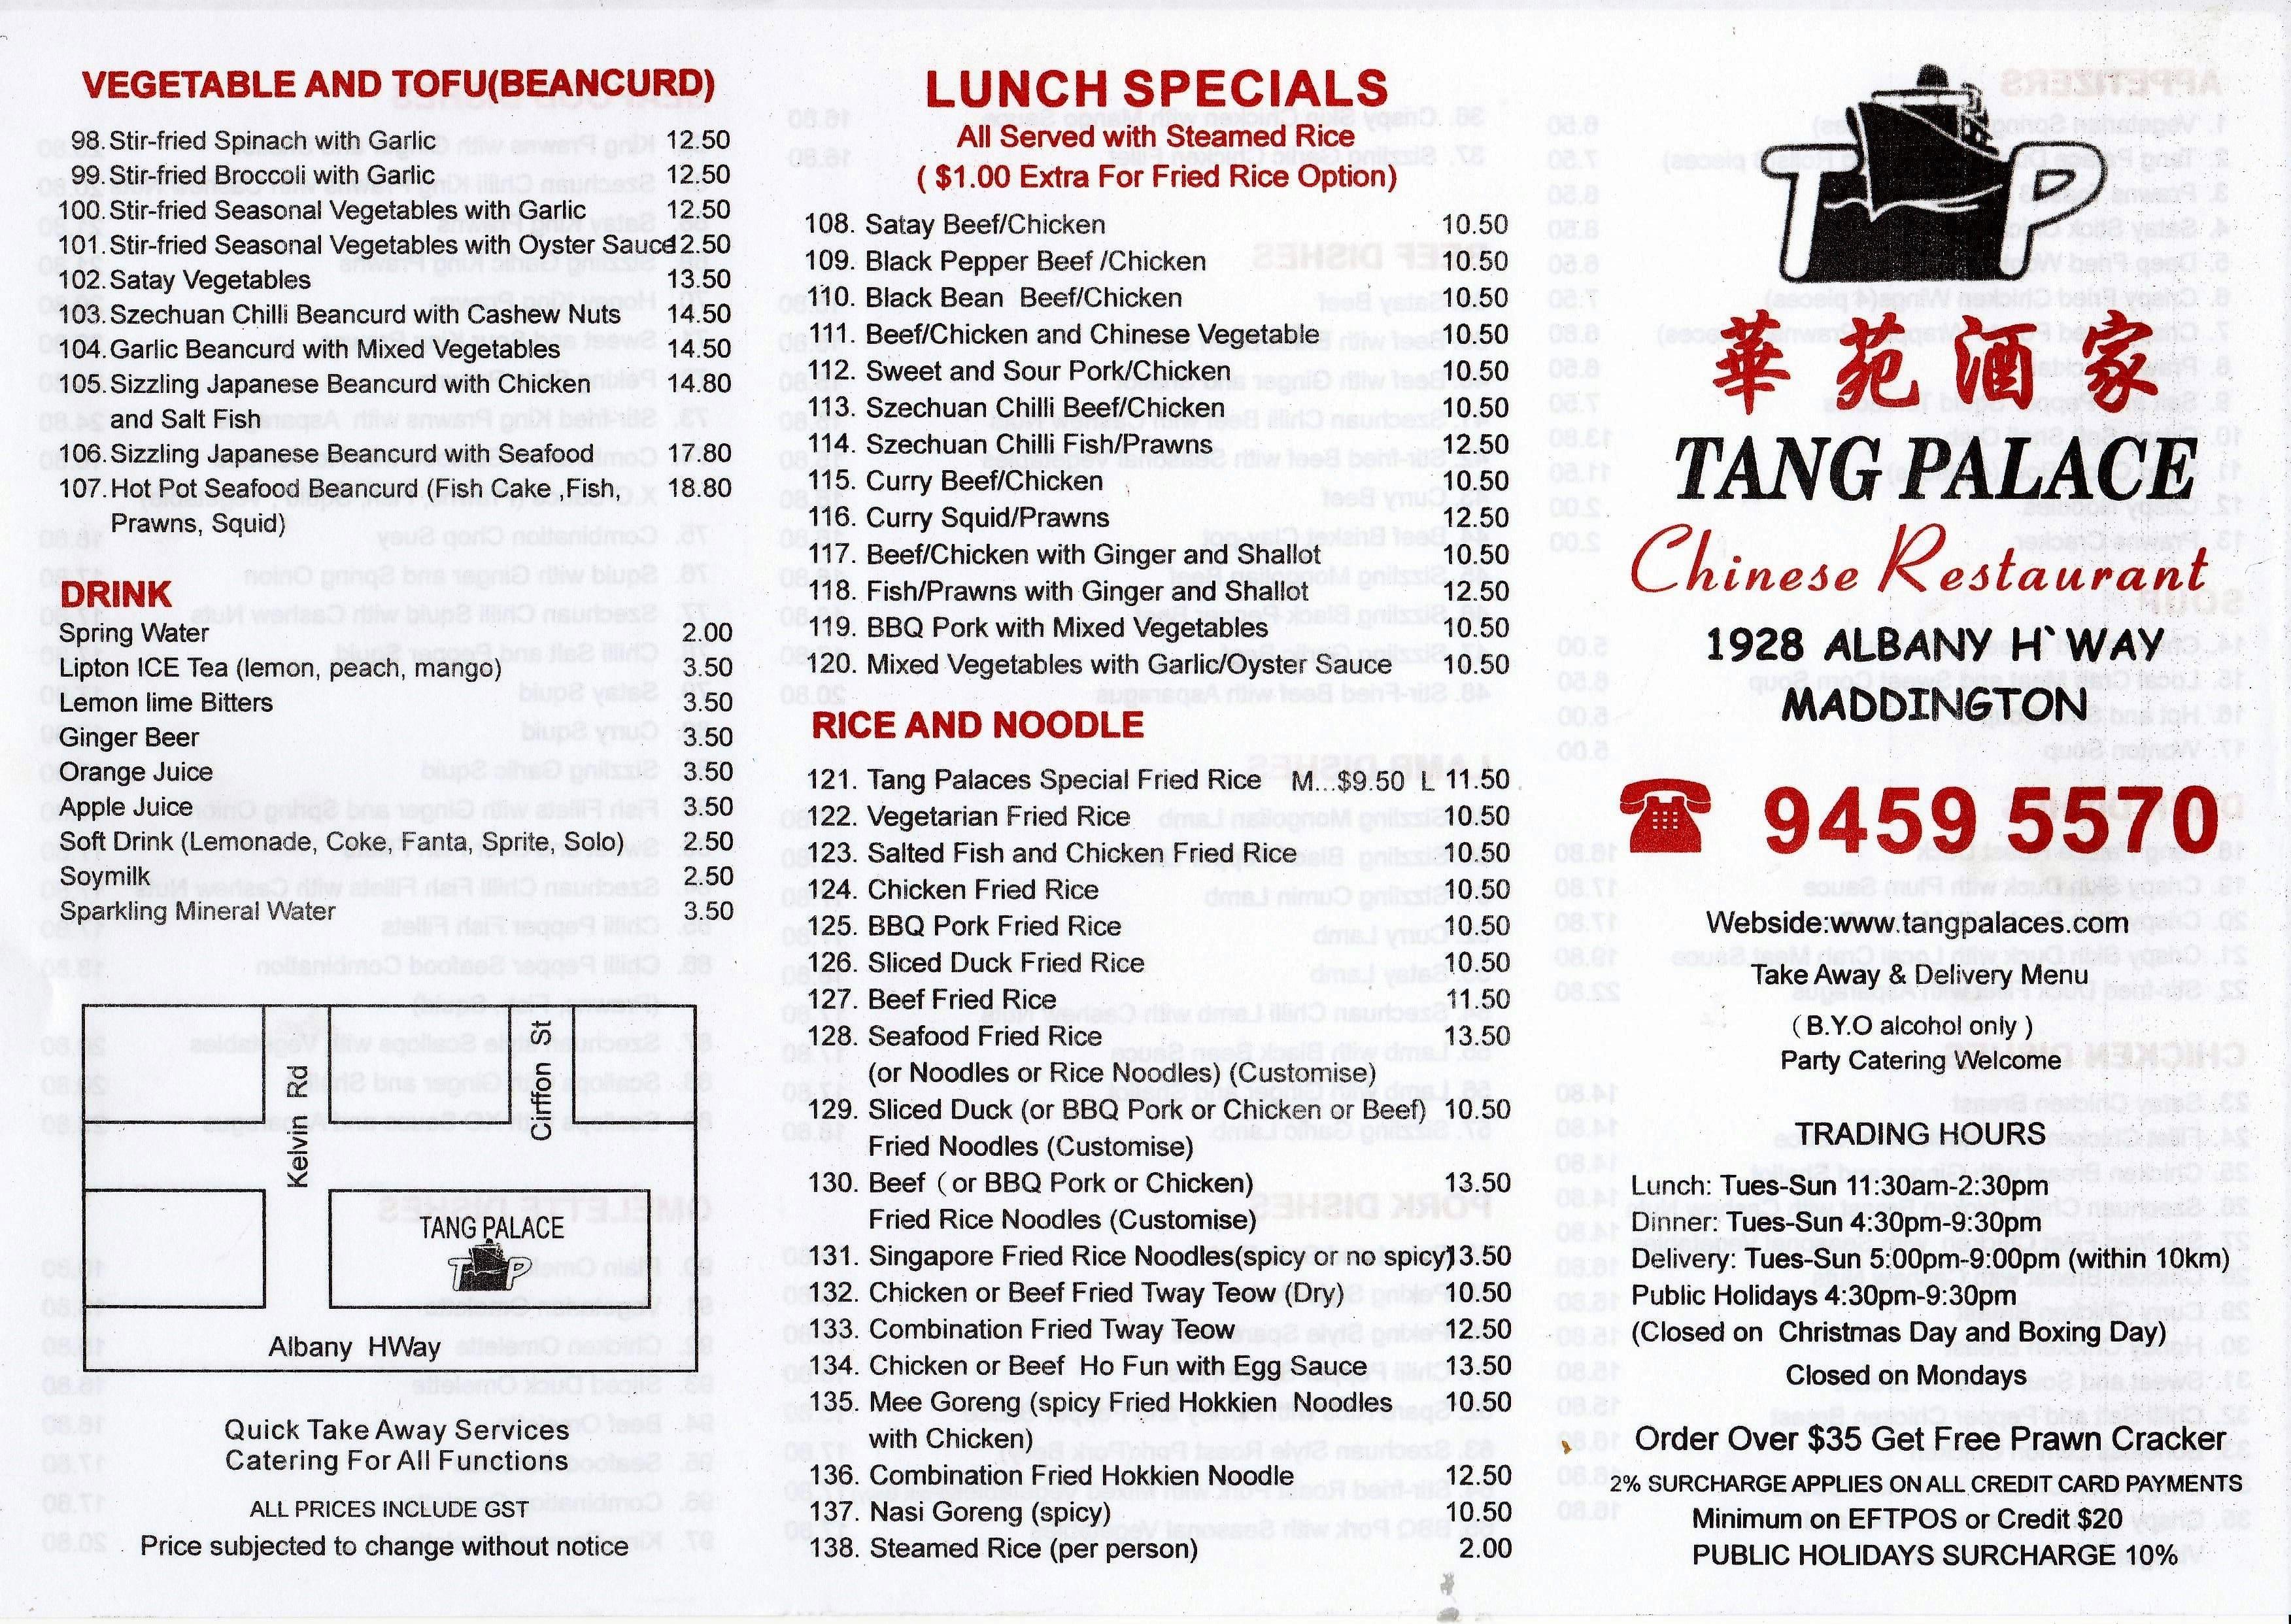 Treasure Palace Chinese Restaurant Maddington Menu